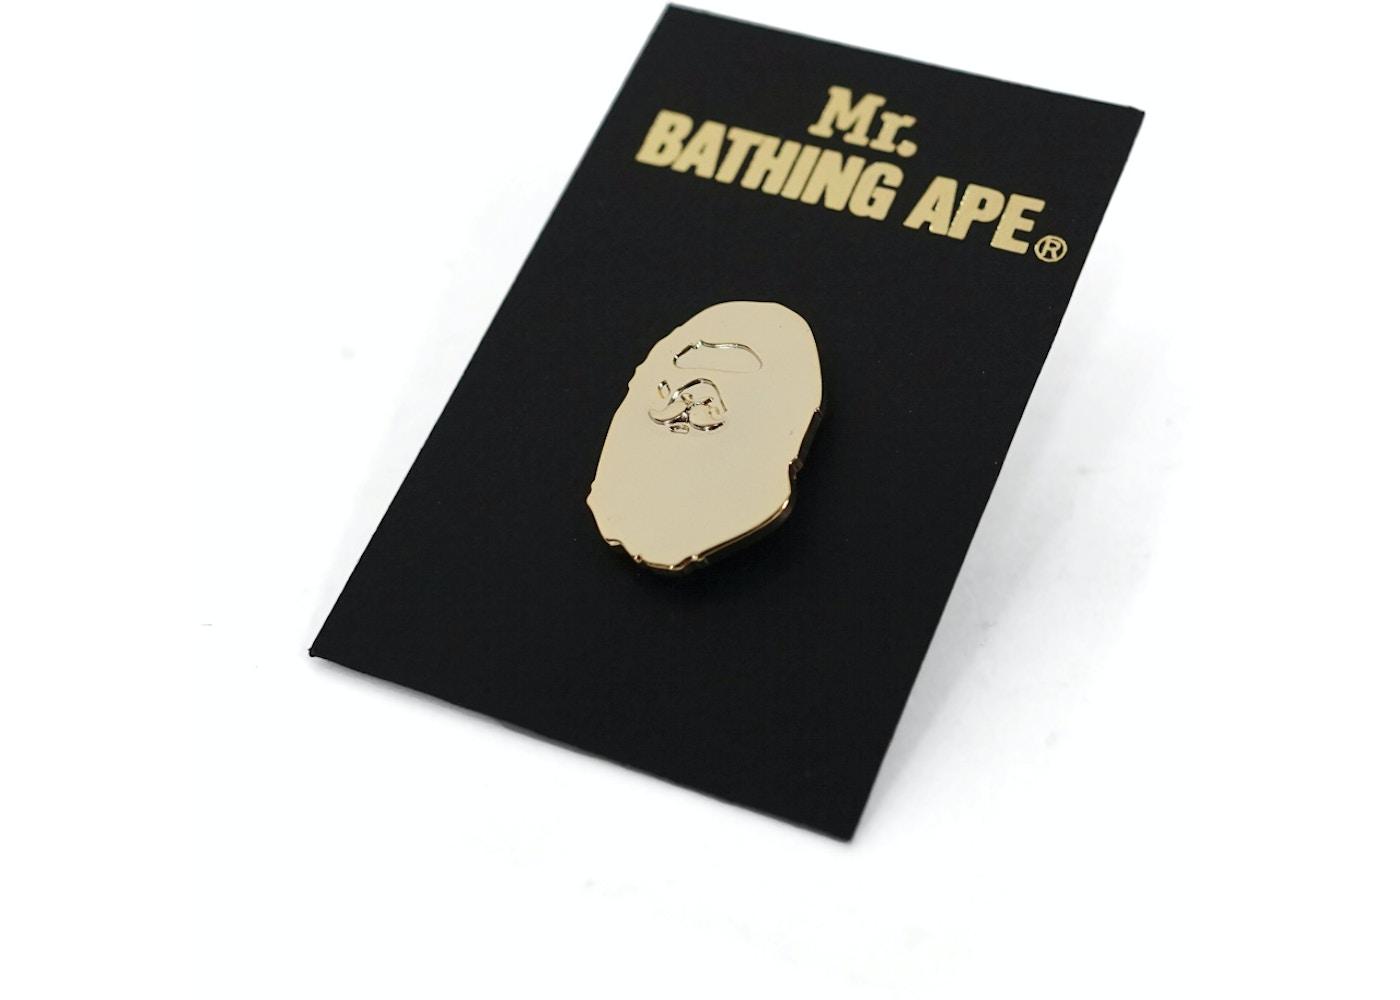 1e0b686e BAPE Mr. Bathing Ape Apehead Pin Gold. Mr. Bathing Ape Apehead